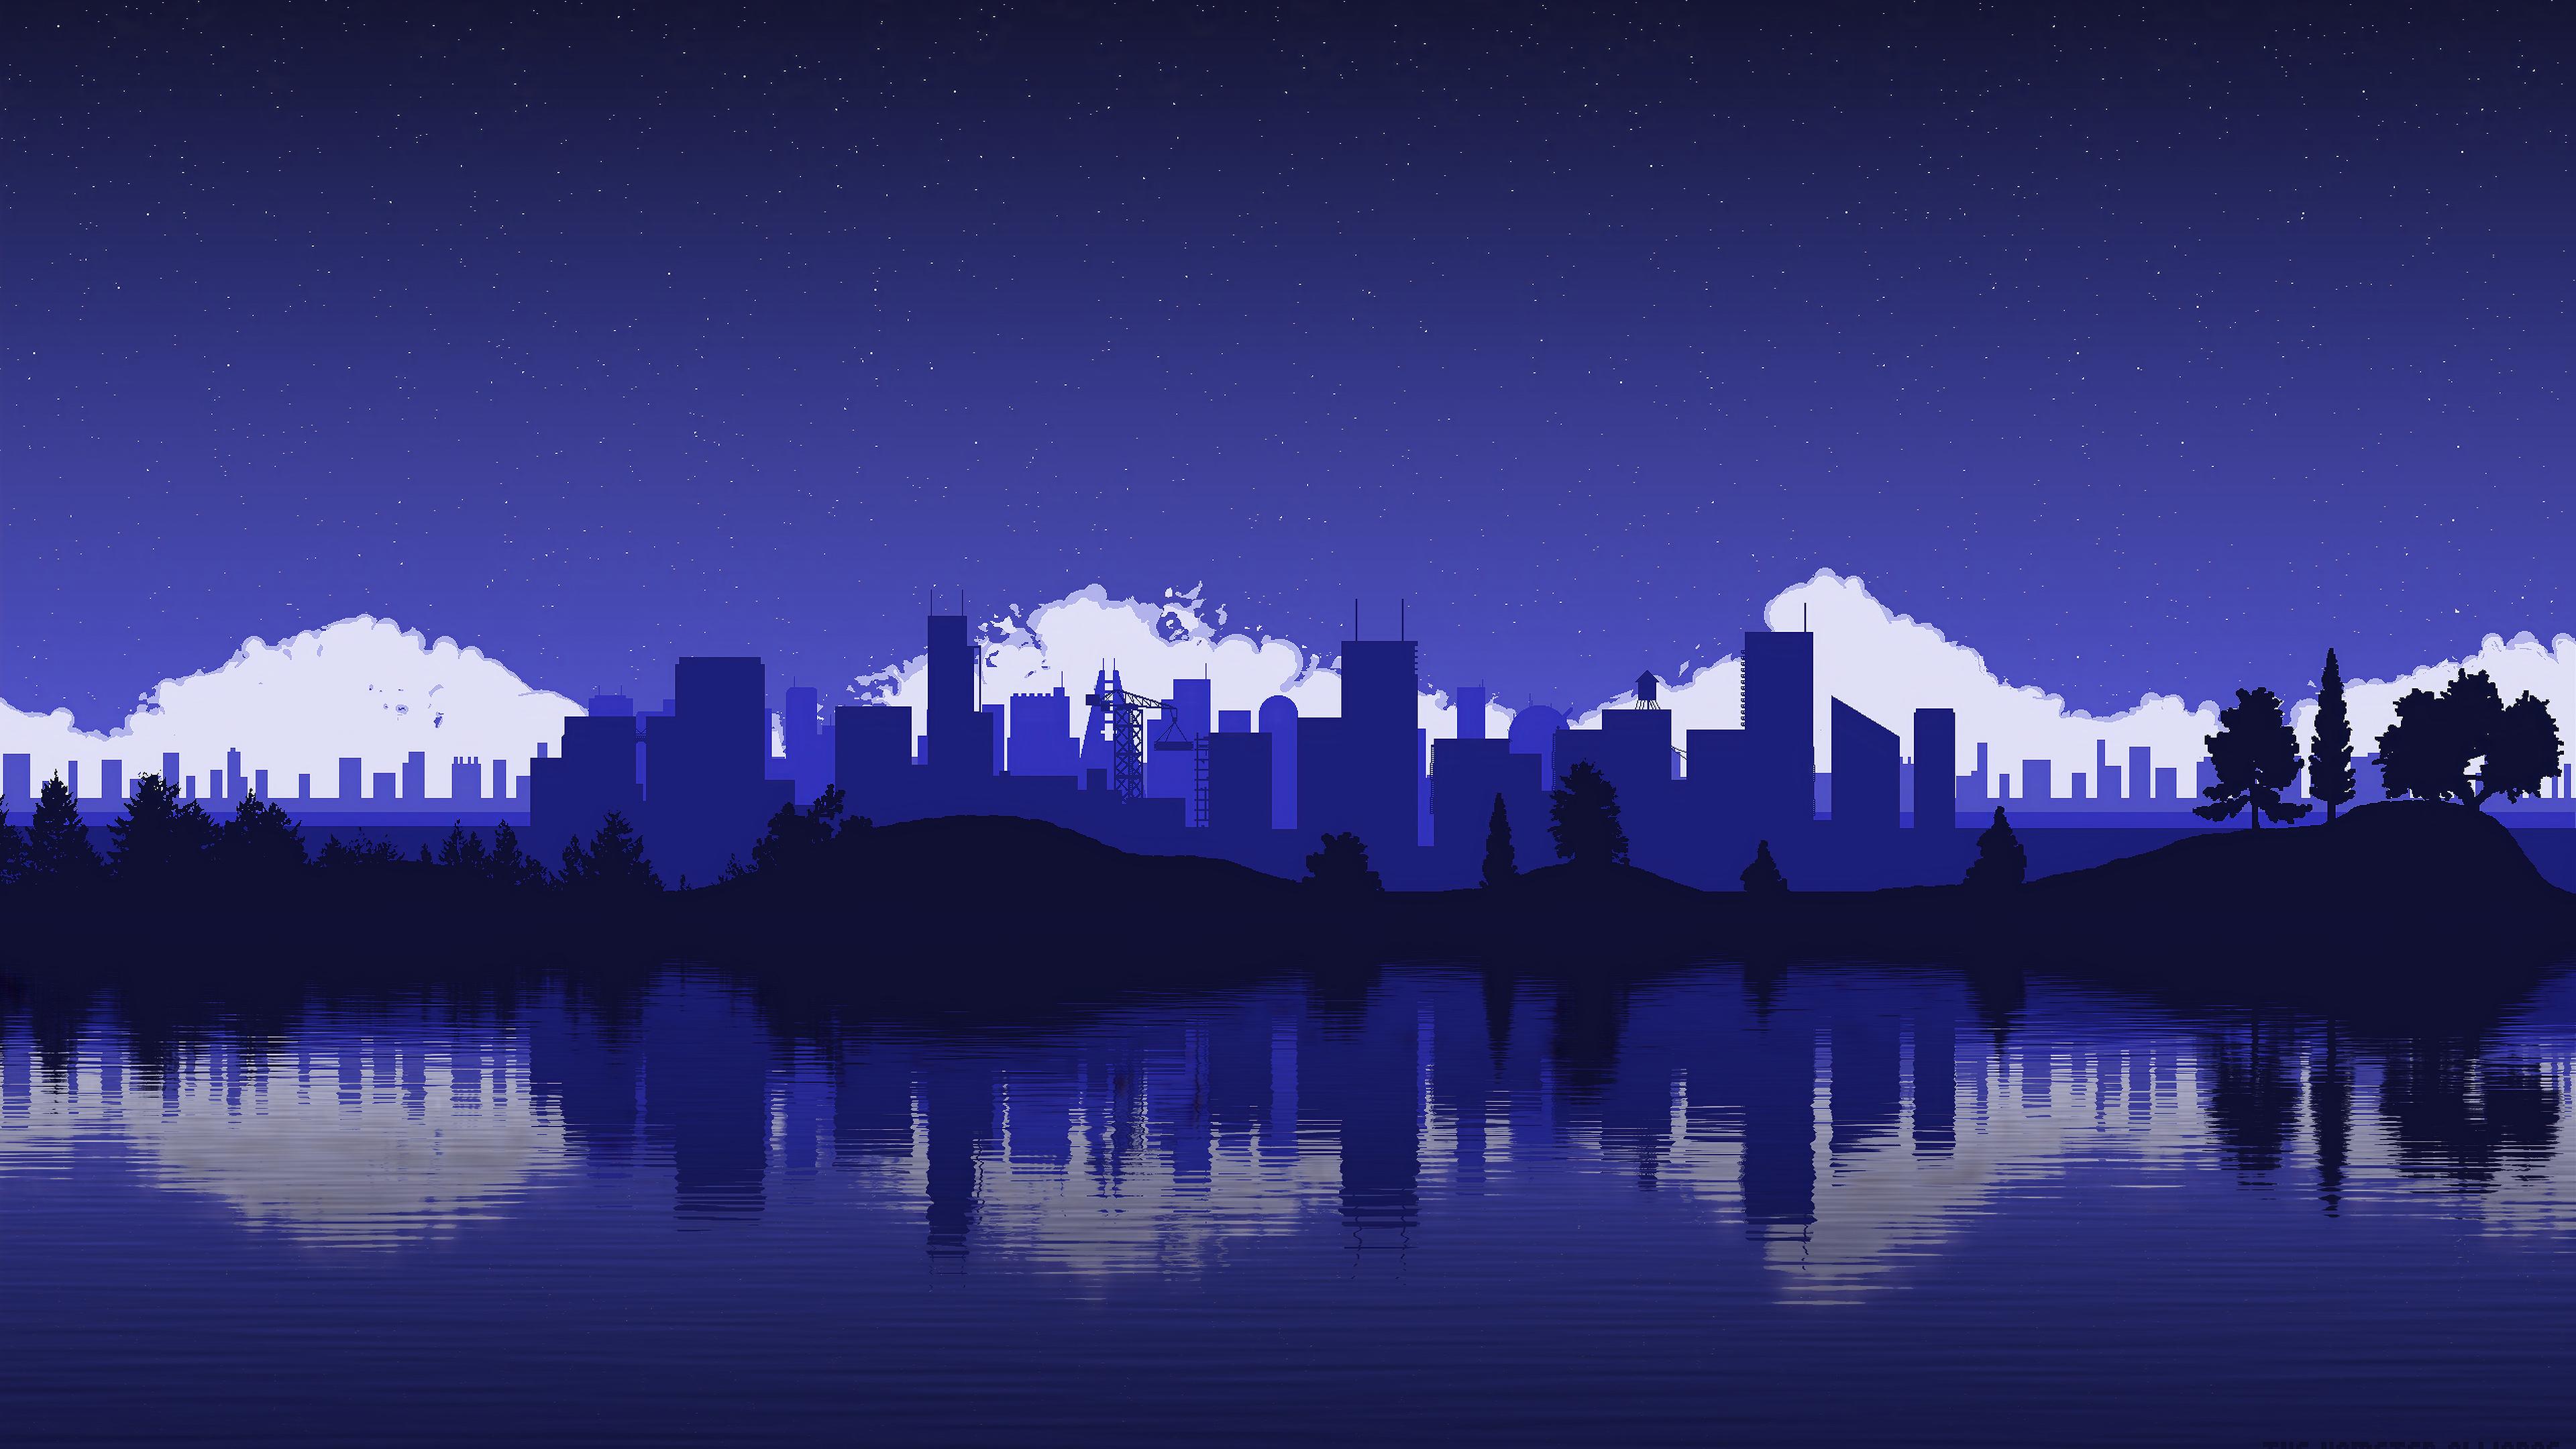 blue-cityscape-minimalist-r1.jpg